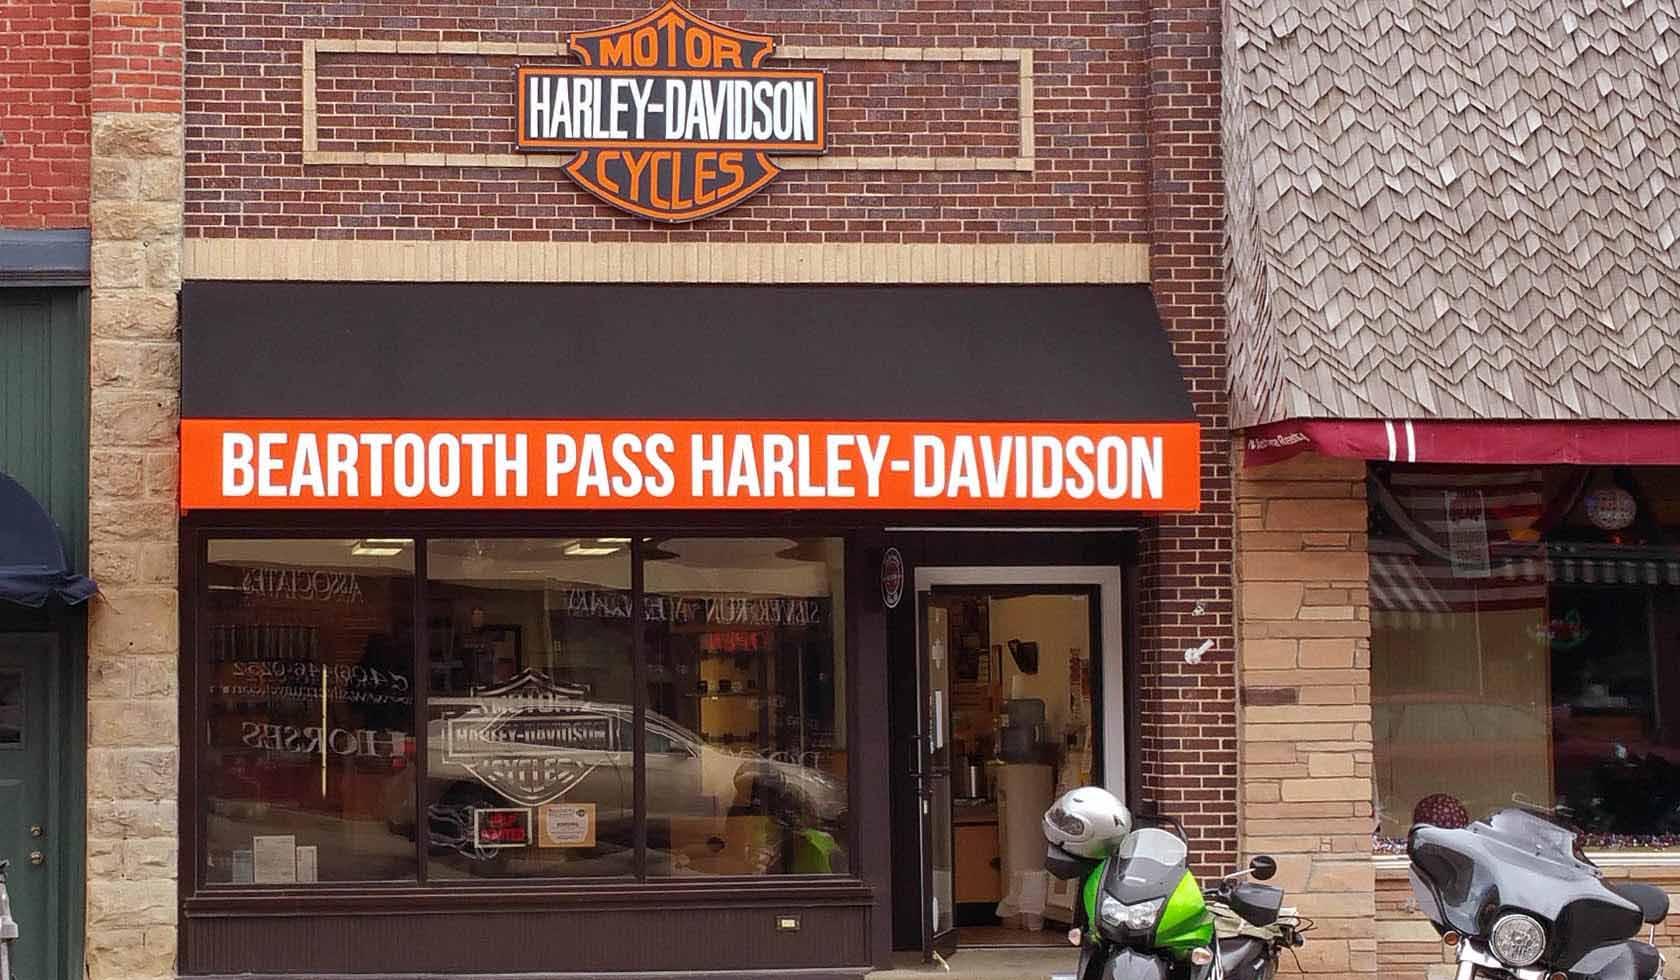 Beartooth Pass Harley-Davidson profile image